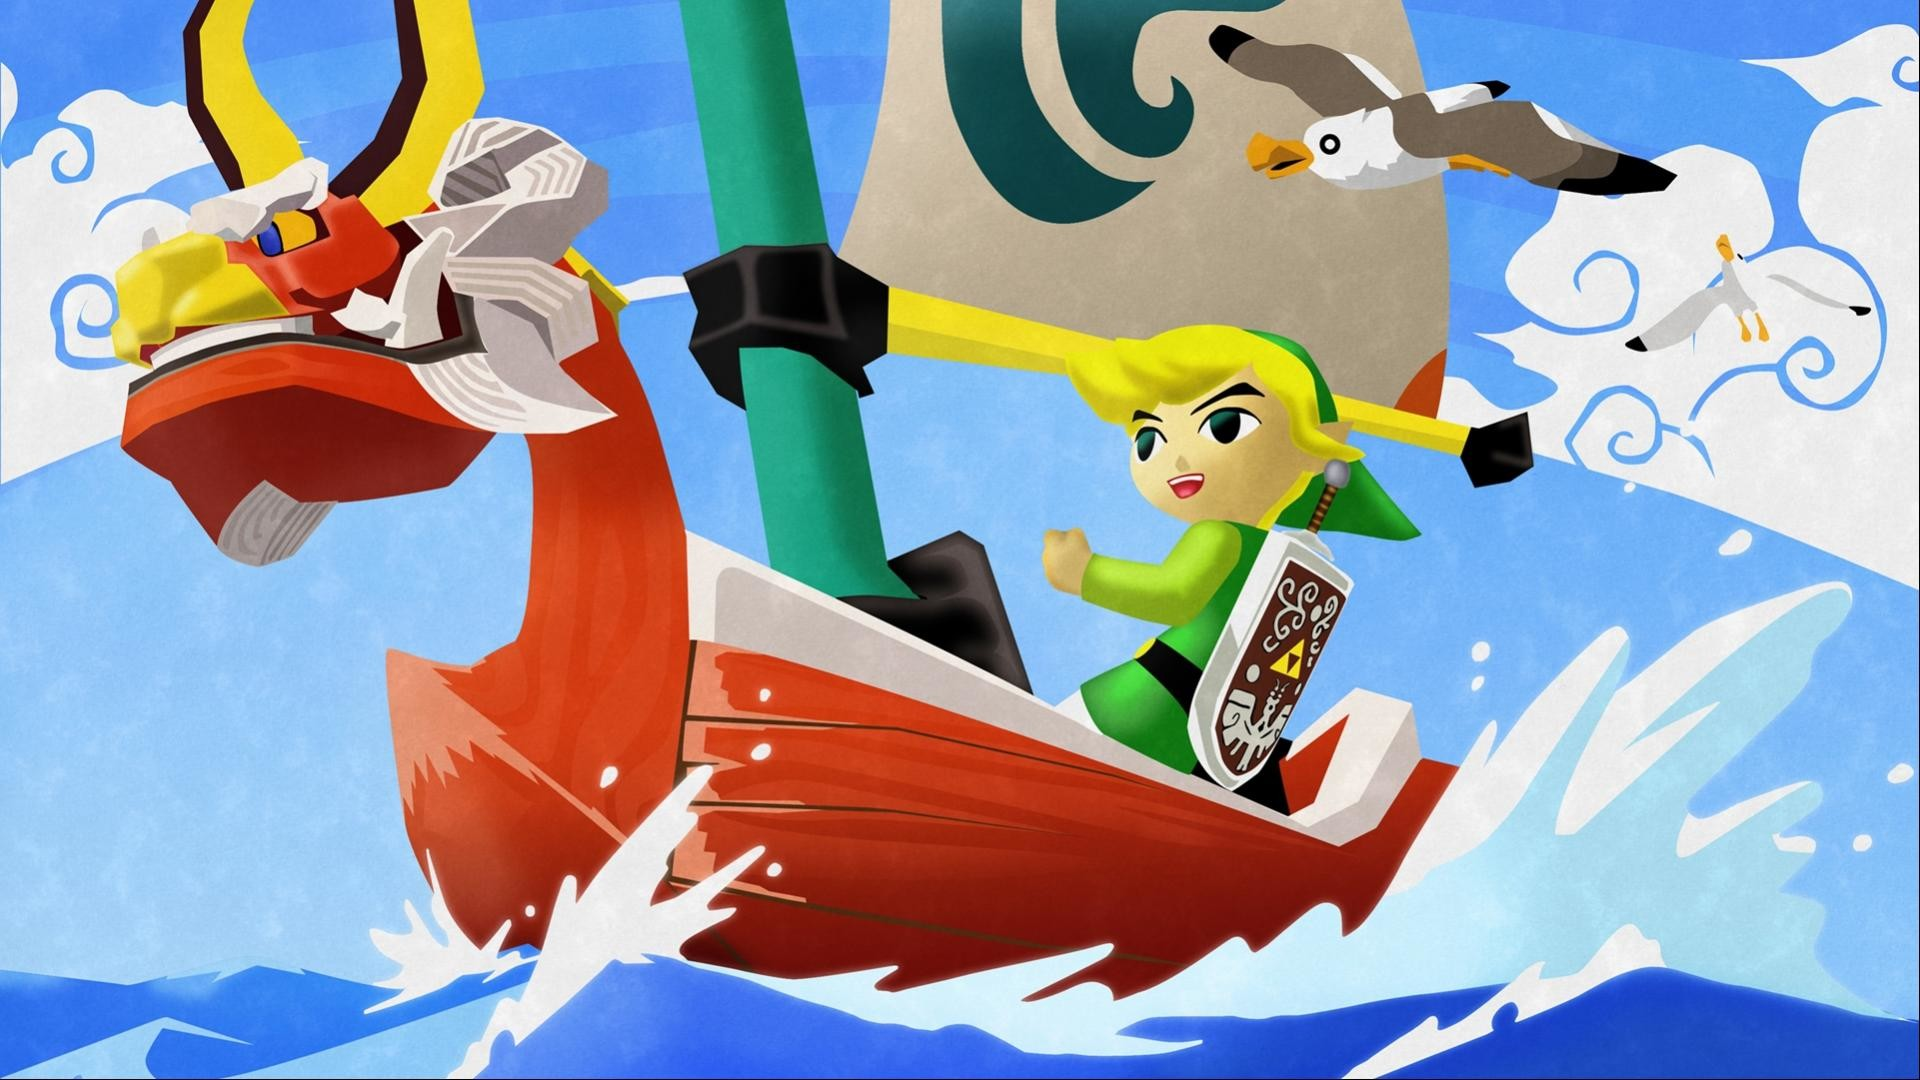 Zelda Wind Waker HD Wallpaper | Cool Wallpapers